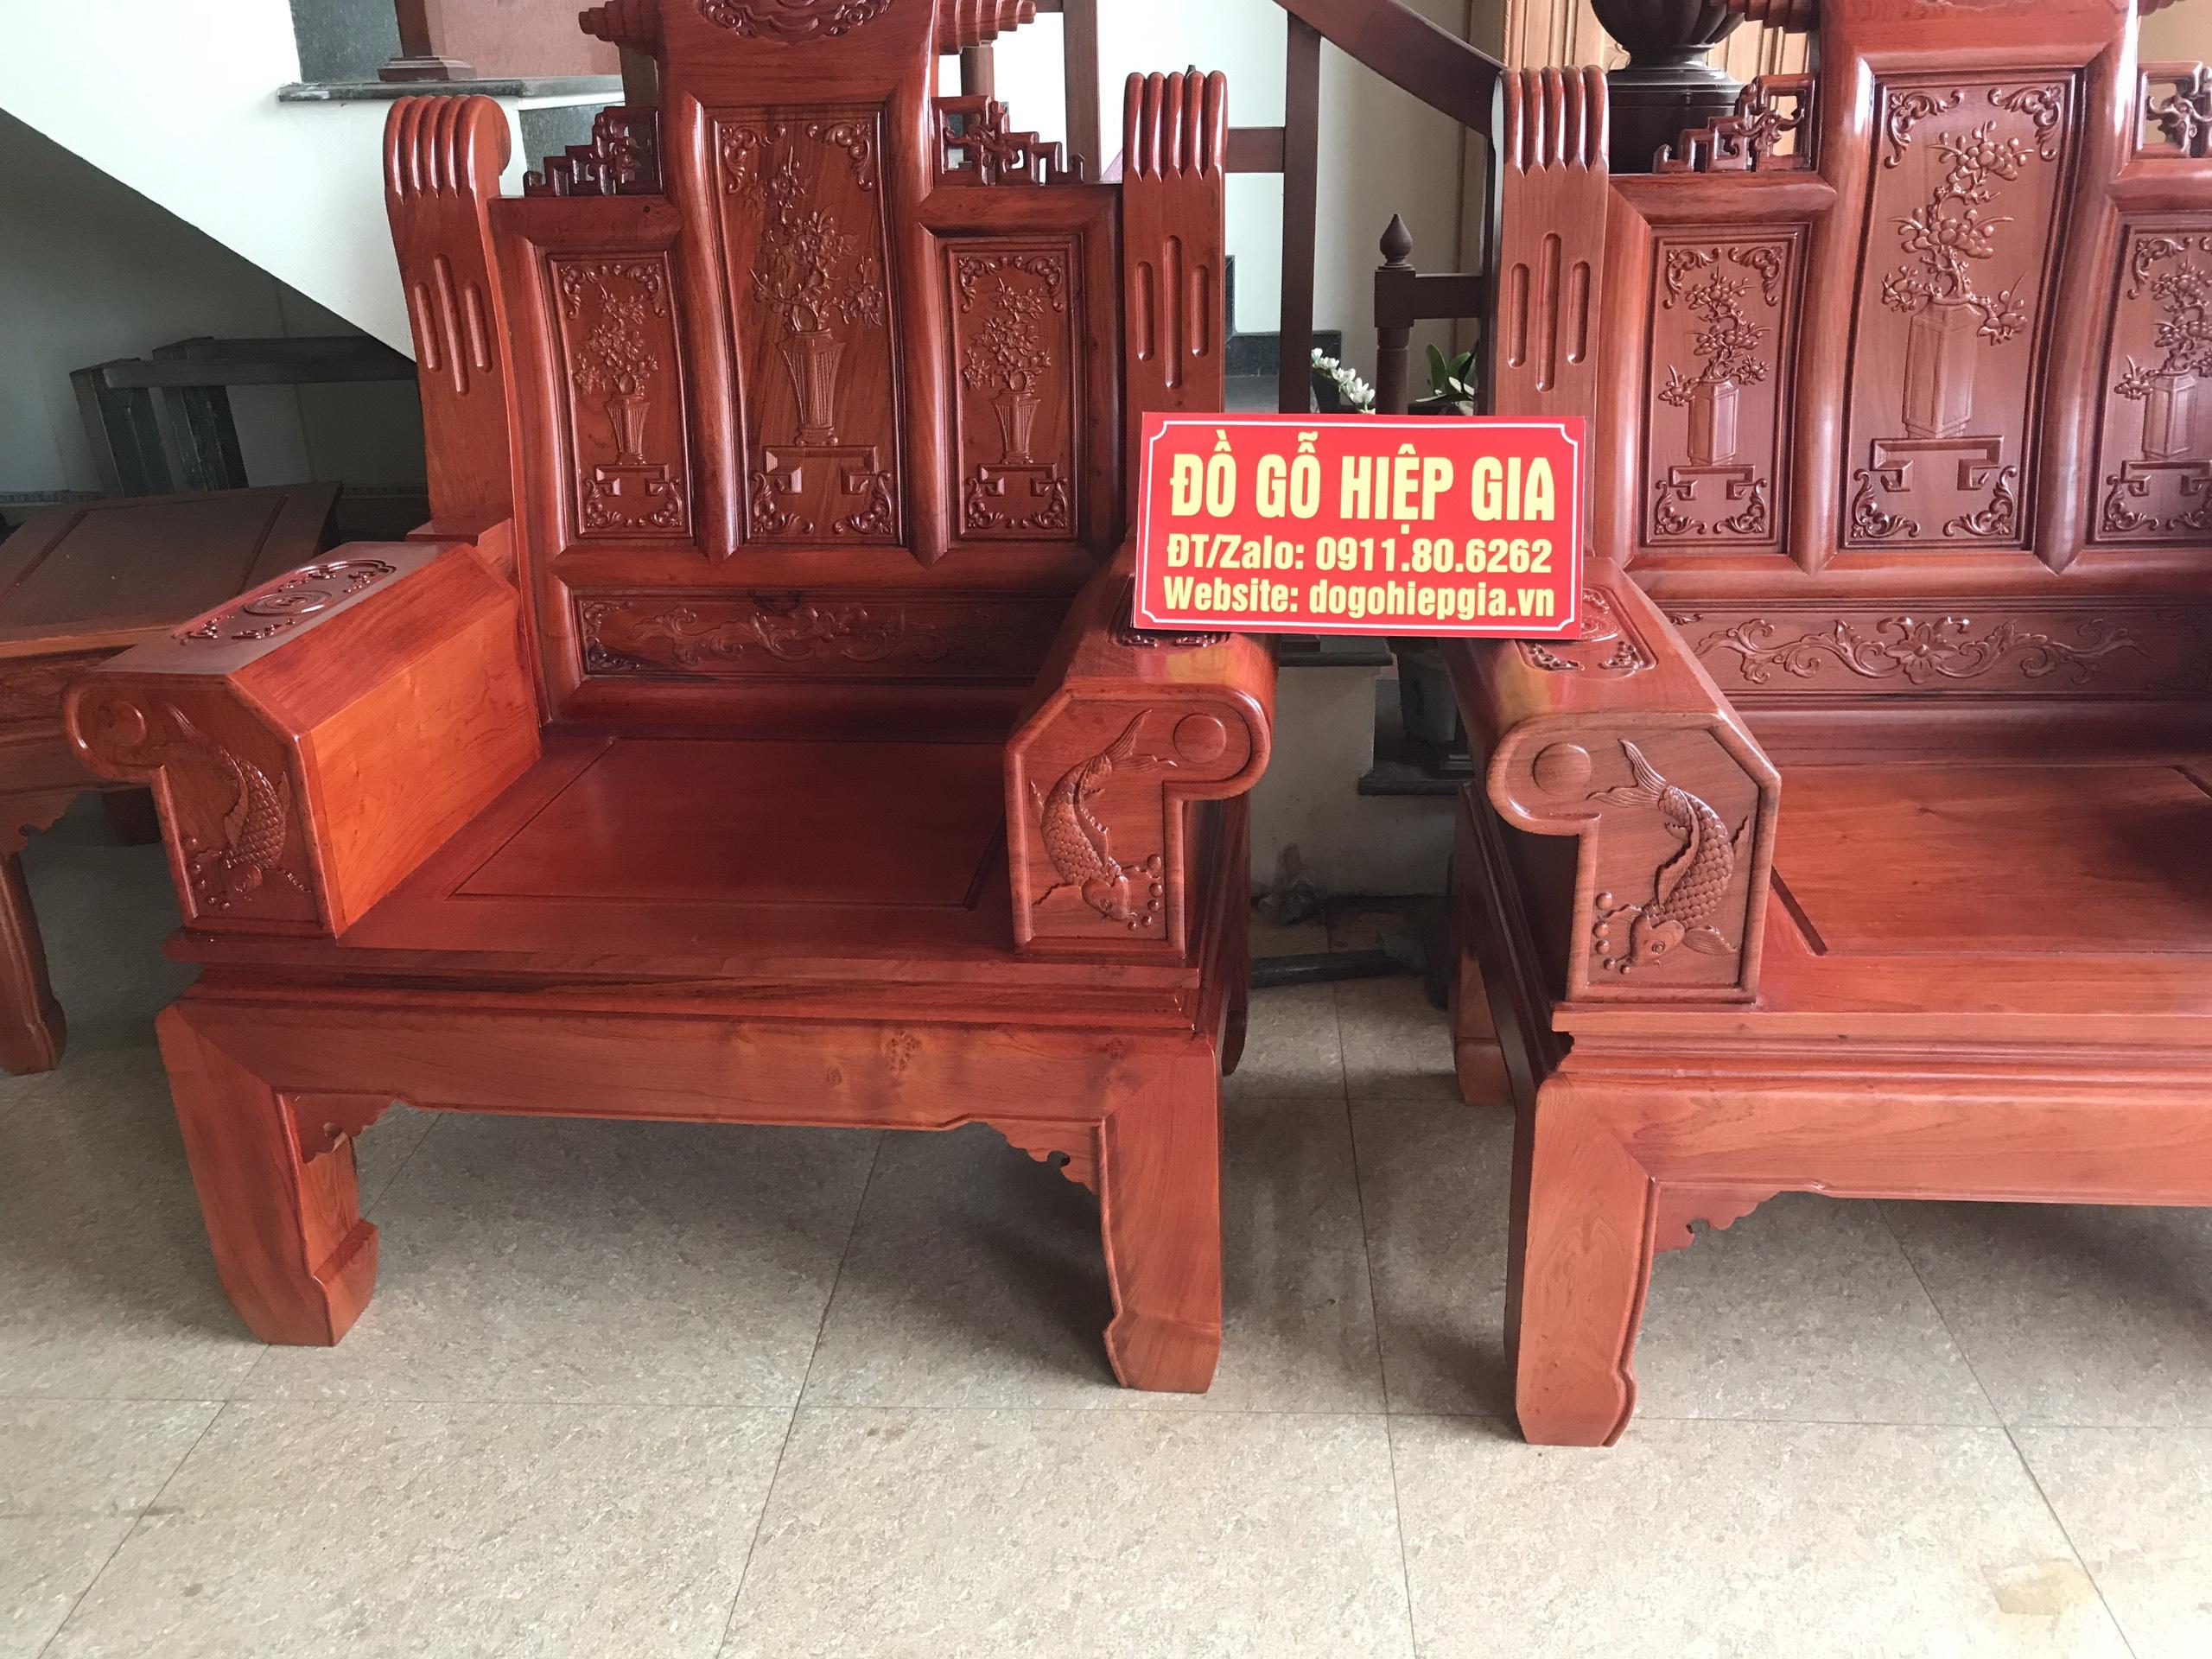 z1543591049046 fafce7f03ca6a47f1059f8a6e98644ce - Salon Minh Hộp Âu Á MS: 53